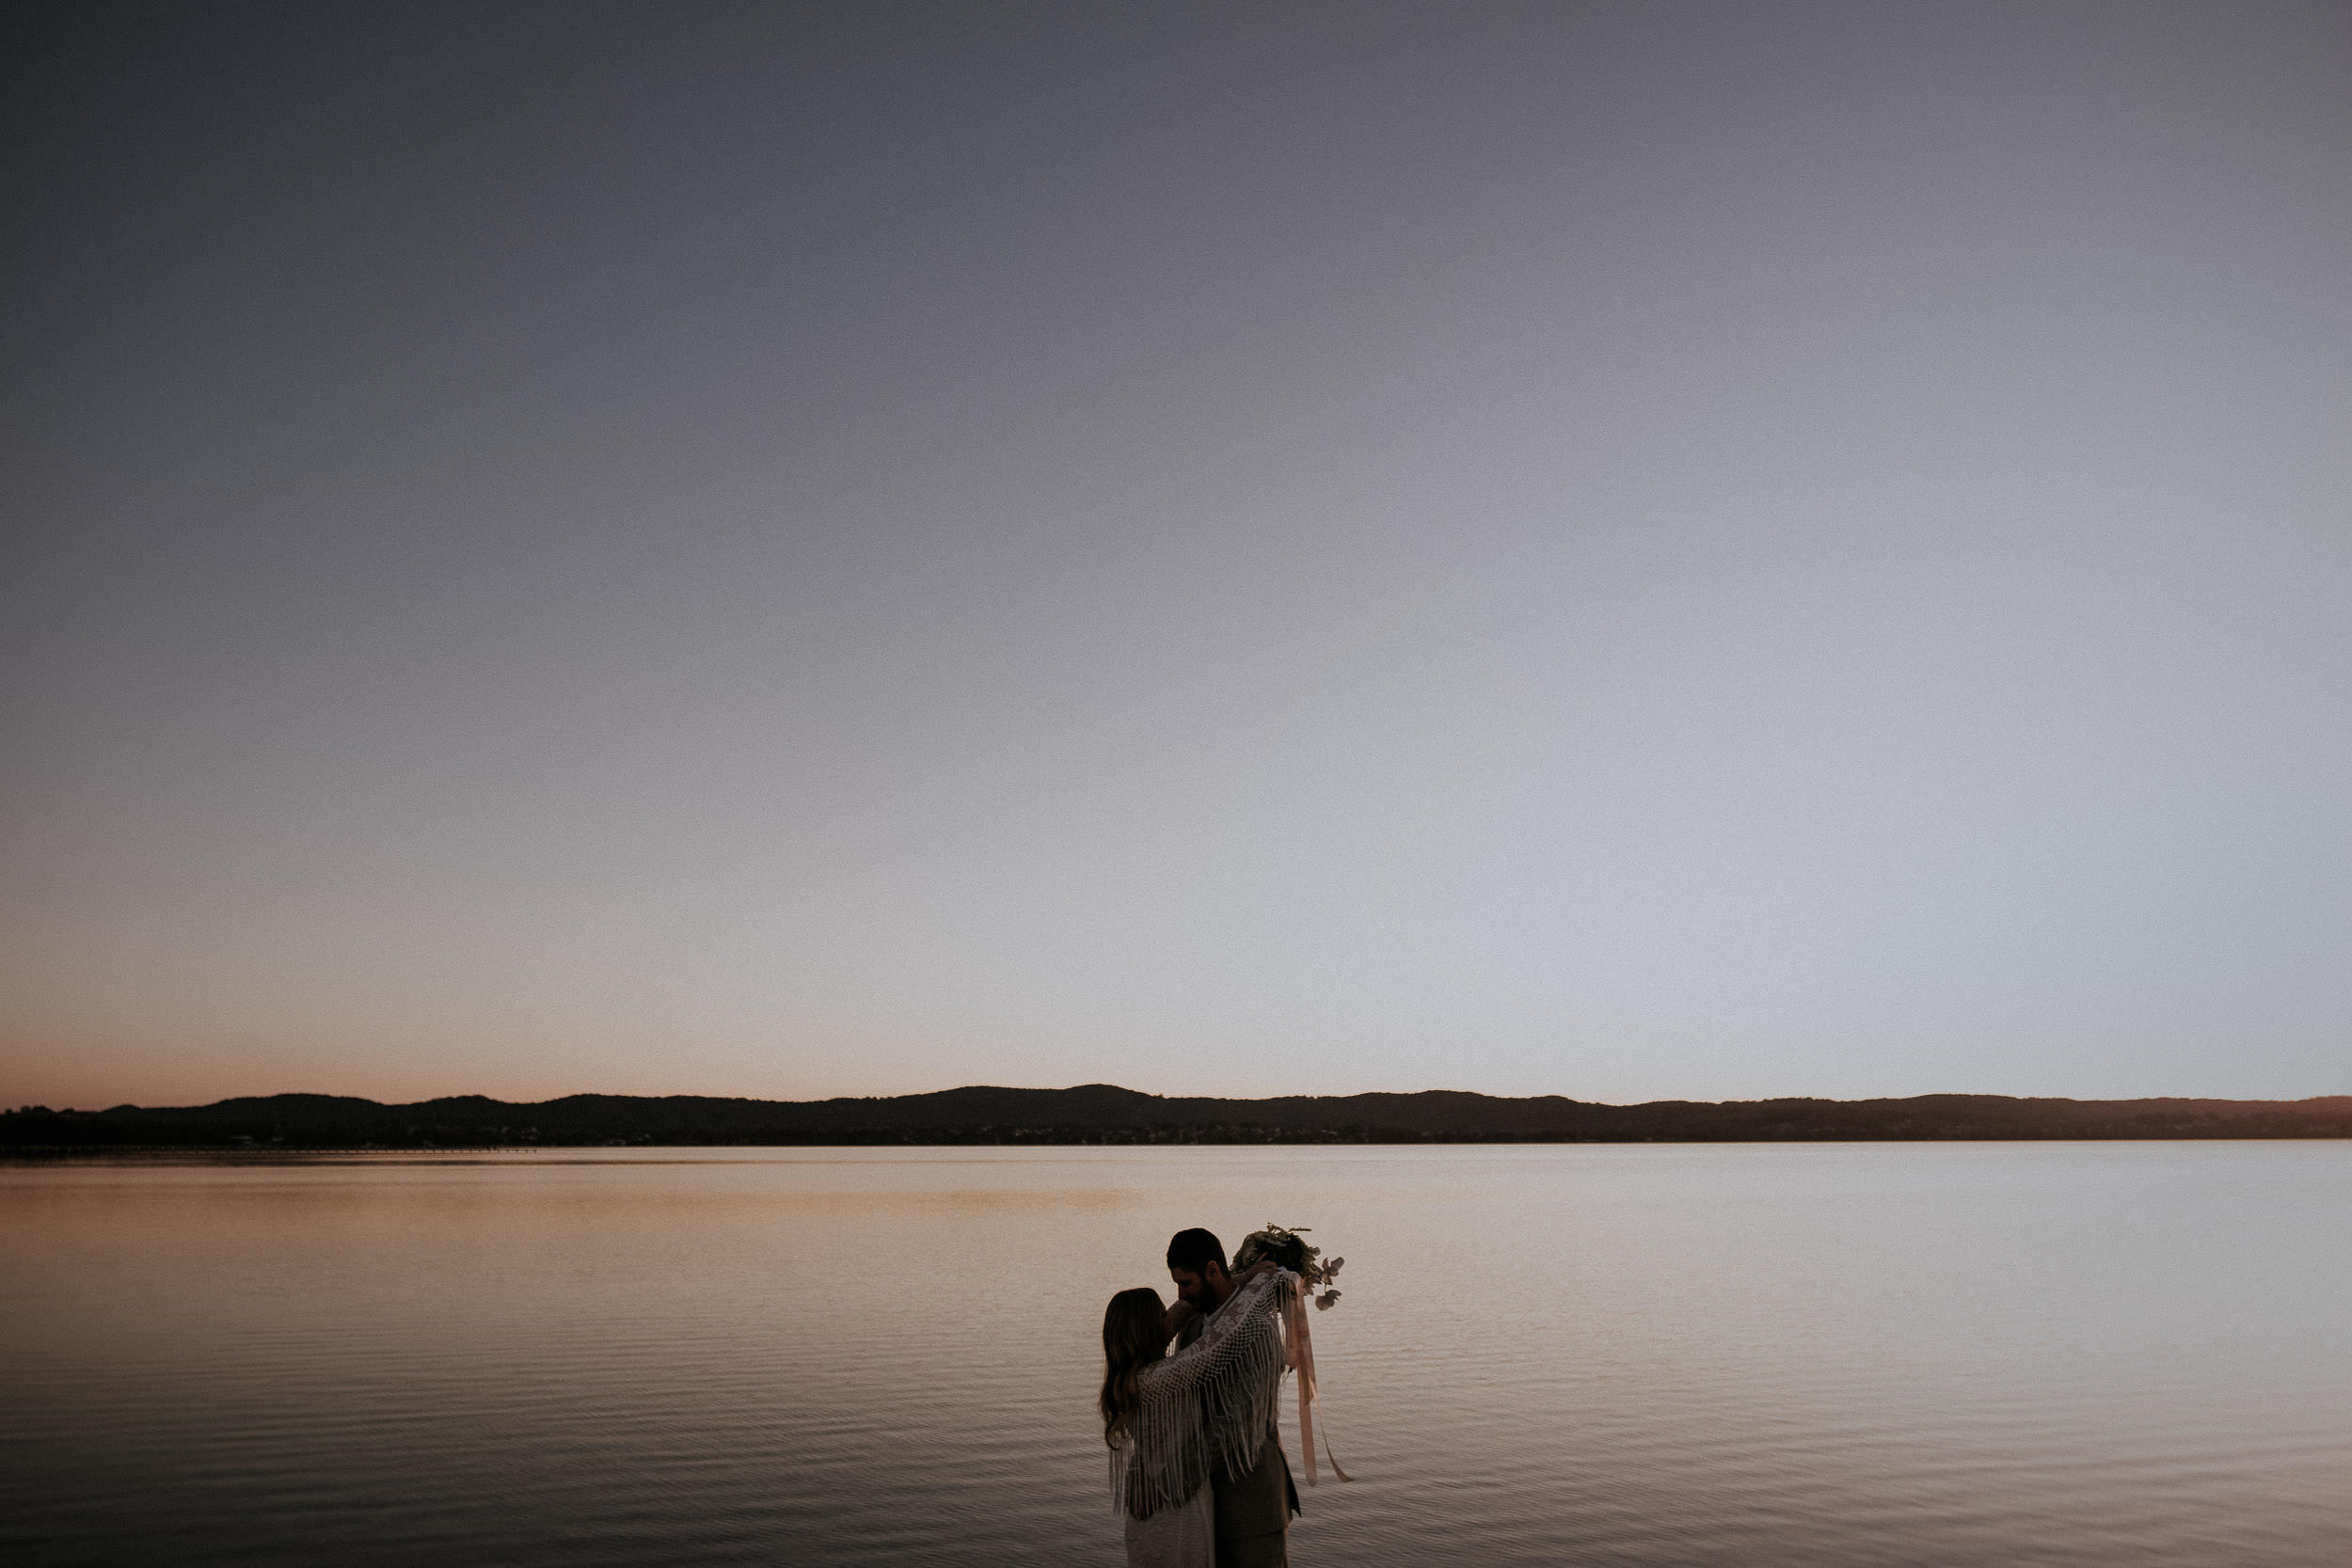 S&A Elopement - Kings & Thieves - Shred 'Til Dead - Central Coast Beach Forest Wedding - 392.jpg